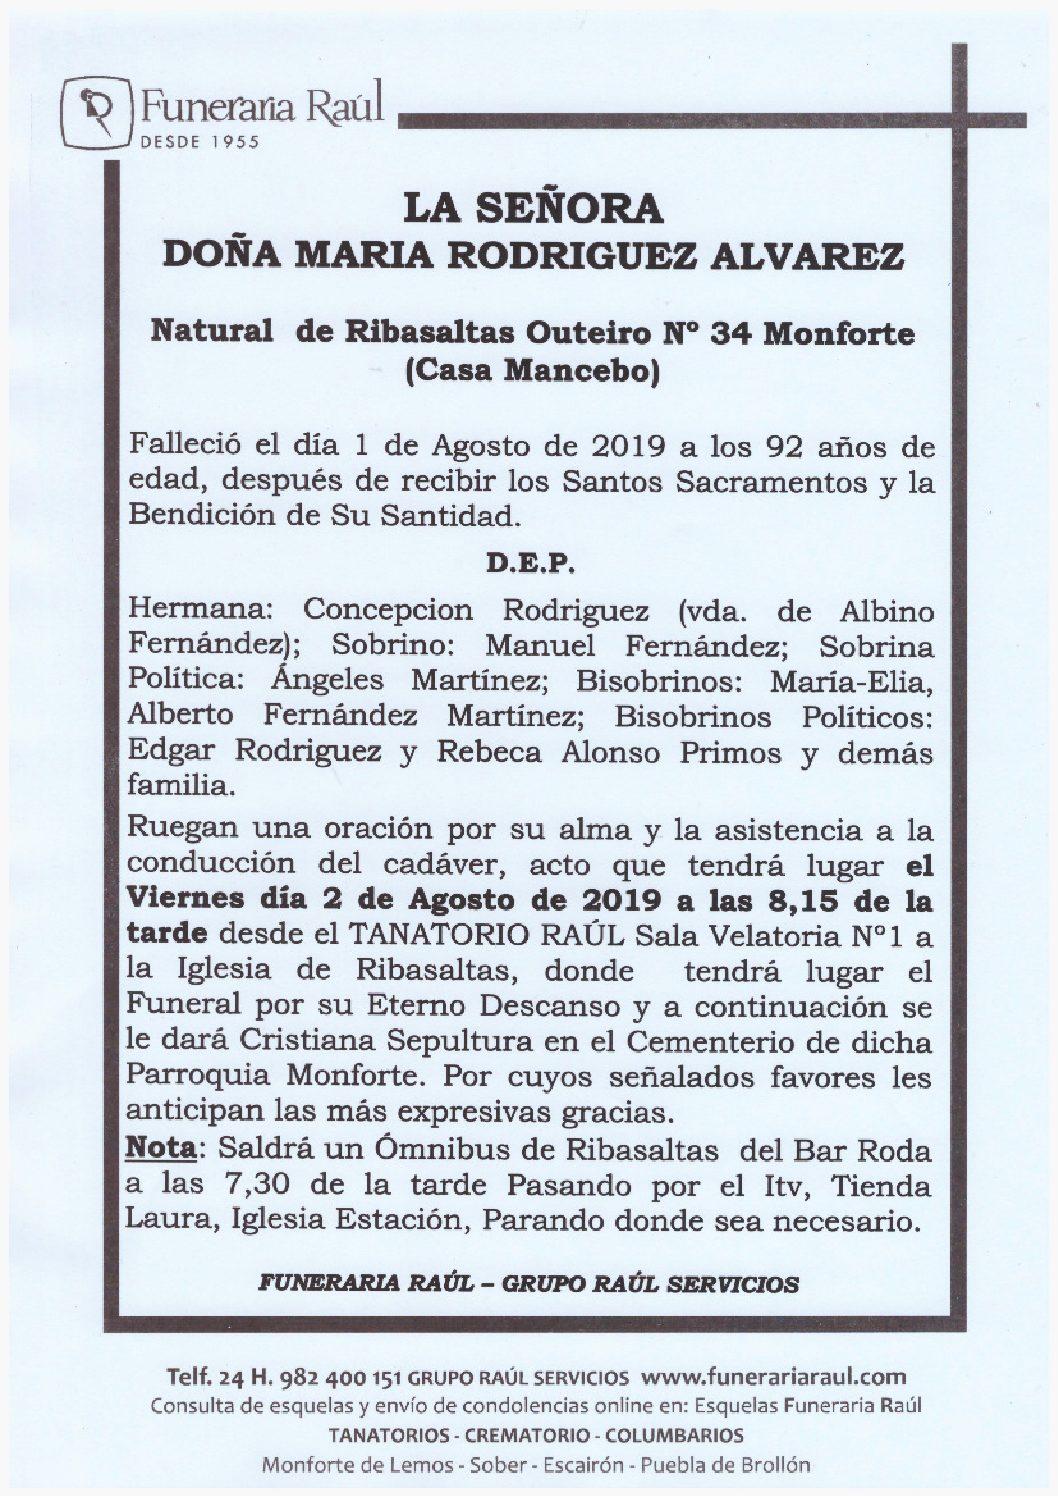 DOÑA MARIA RODRIGUEZ ALVAREZ